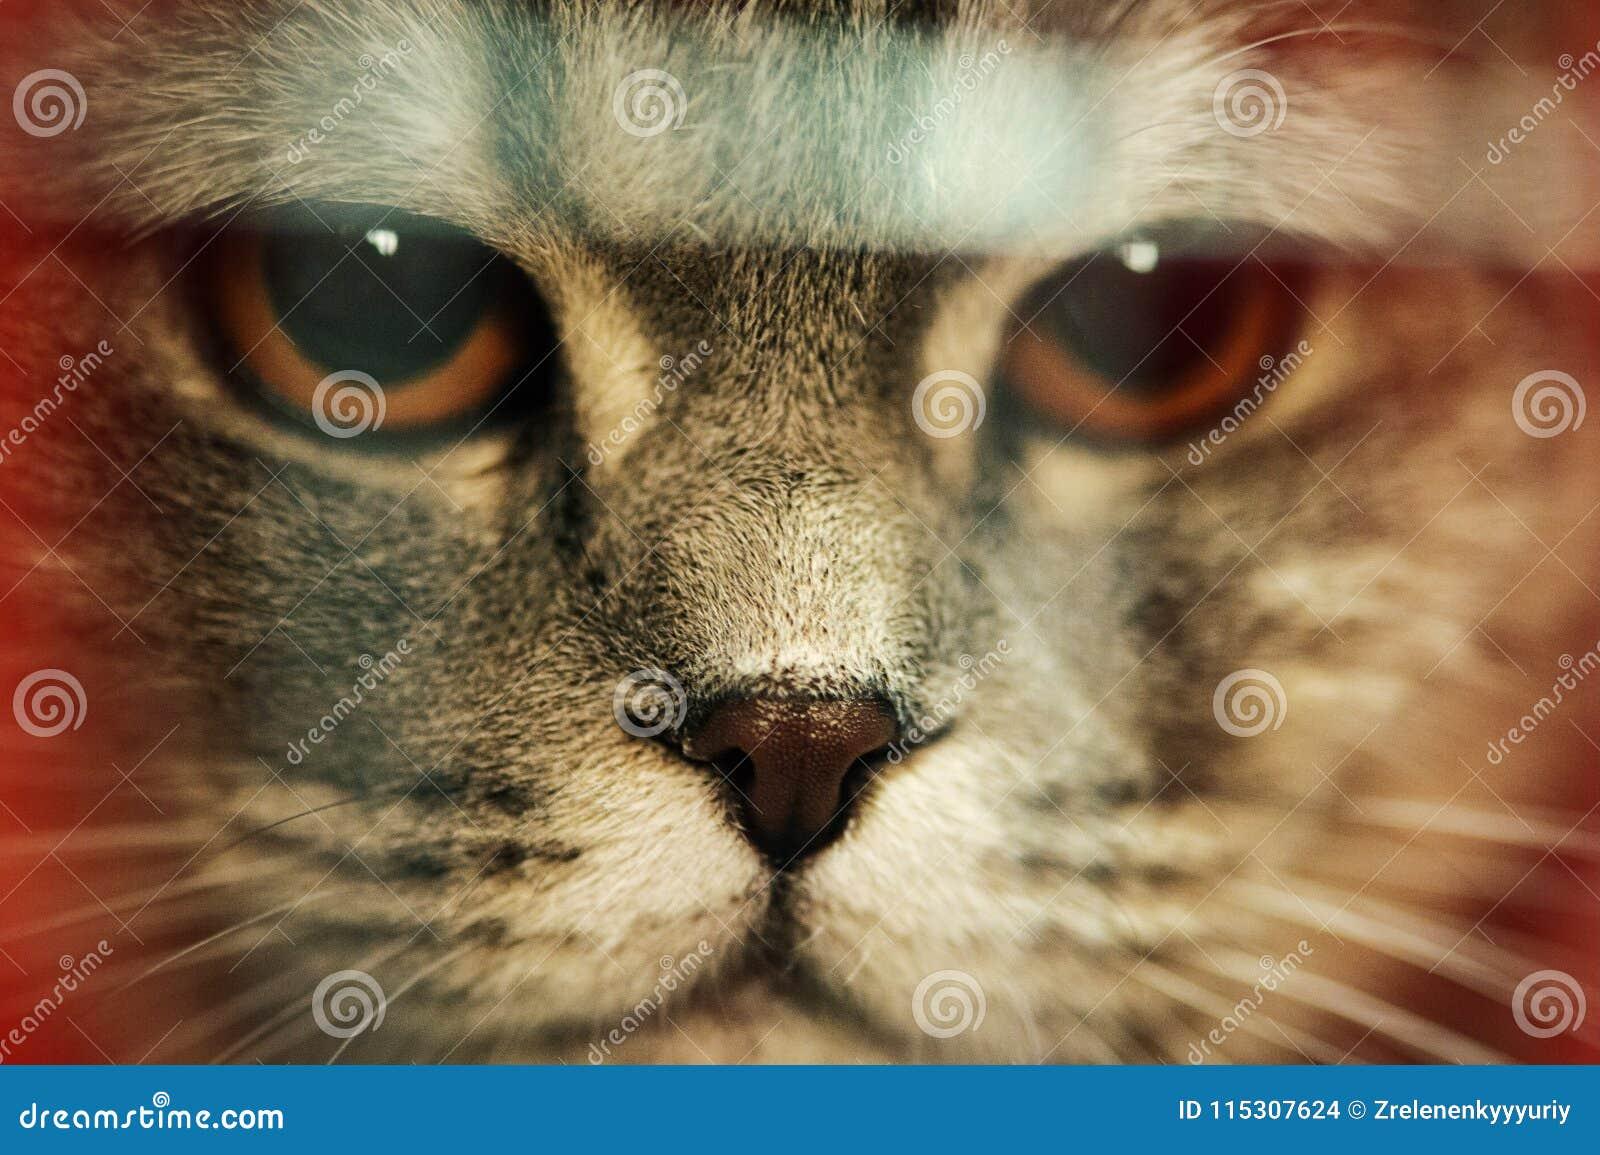 Funny cats close up